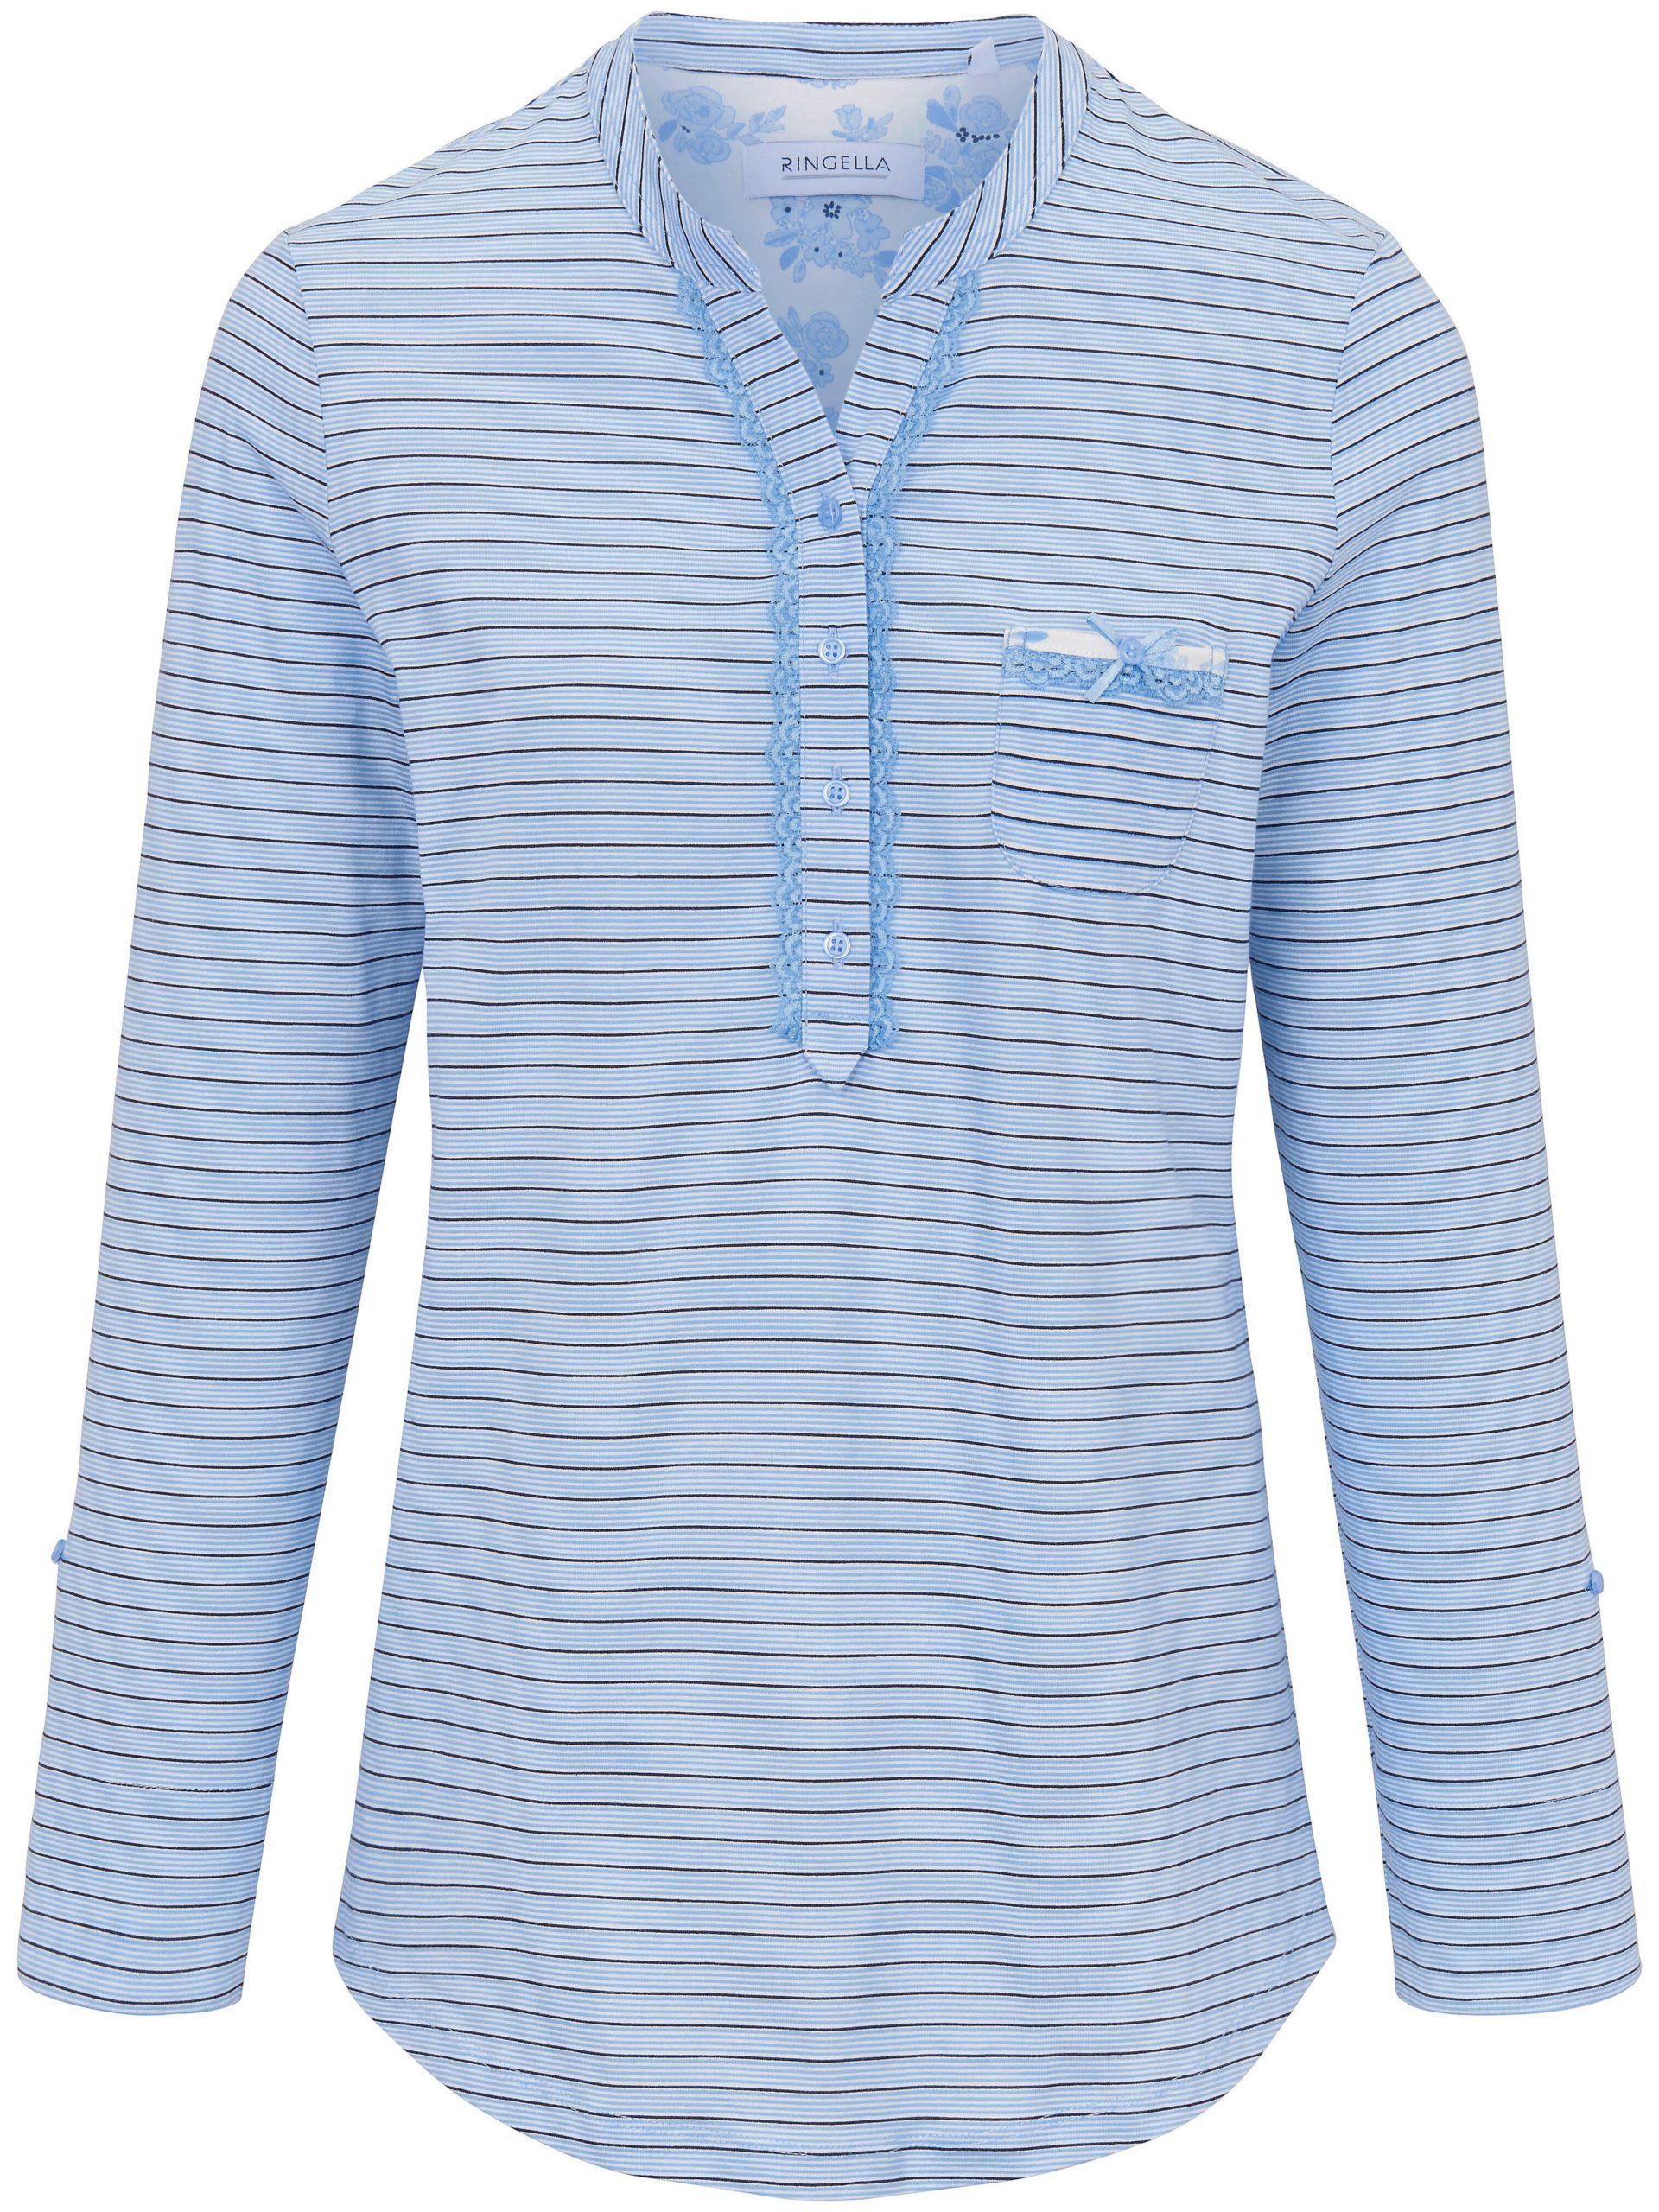 Pyjama Van Ringella multicolour Kopen